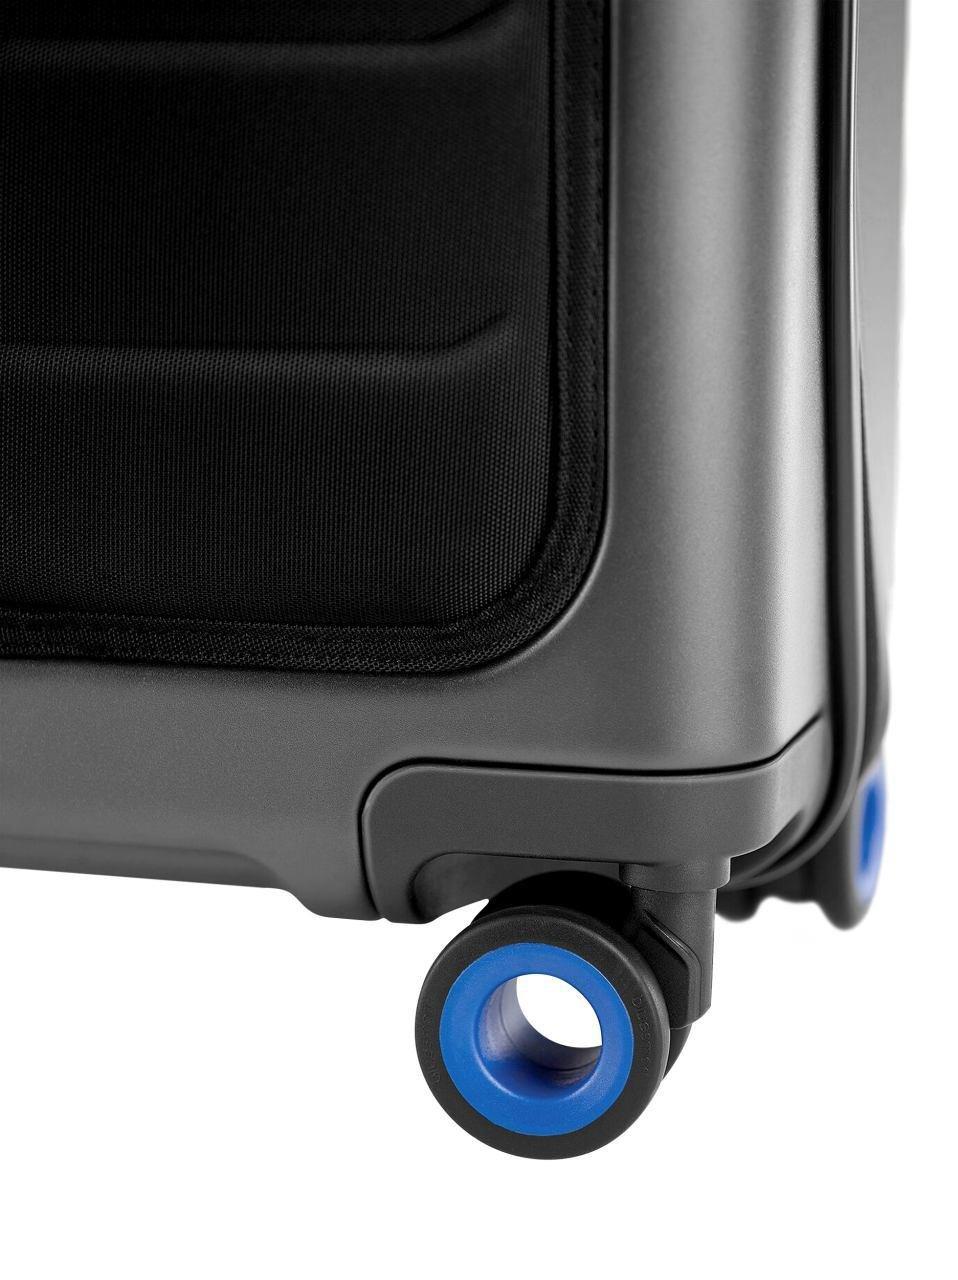 Finest Amazon.com | Bluesmart One - Smart Luggage: GPS, Remote Locking  DX37